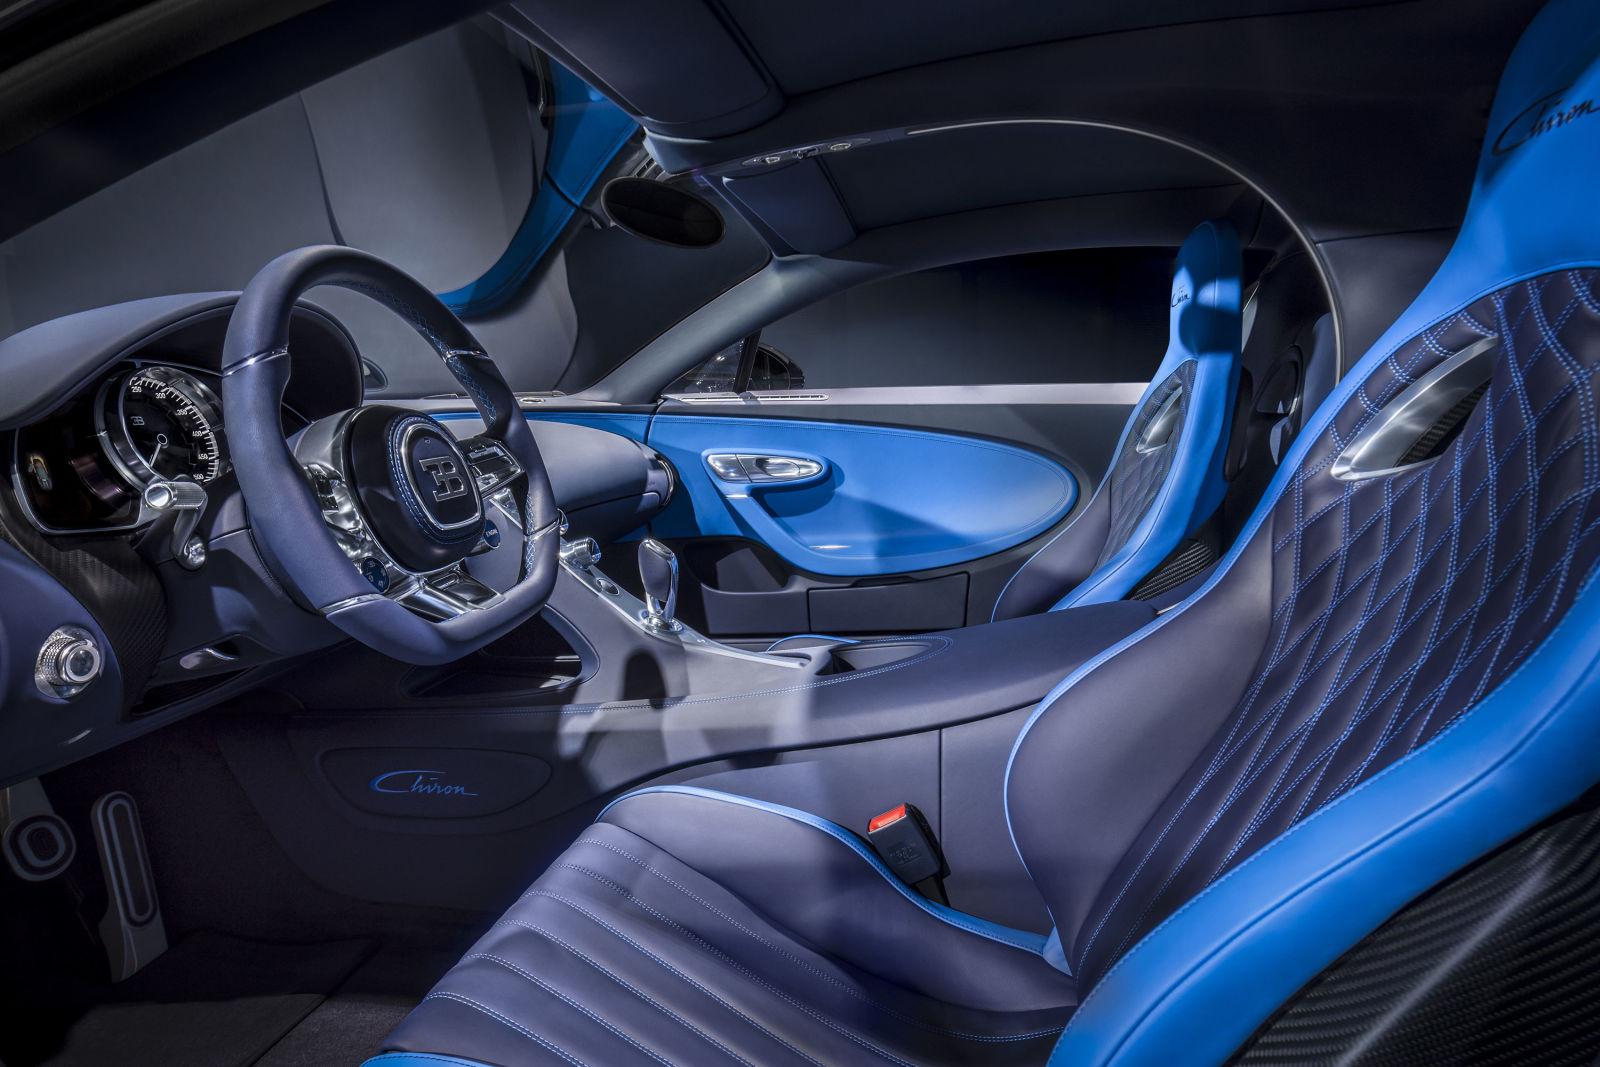 B5-Generation Audi S4